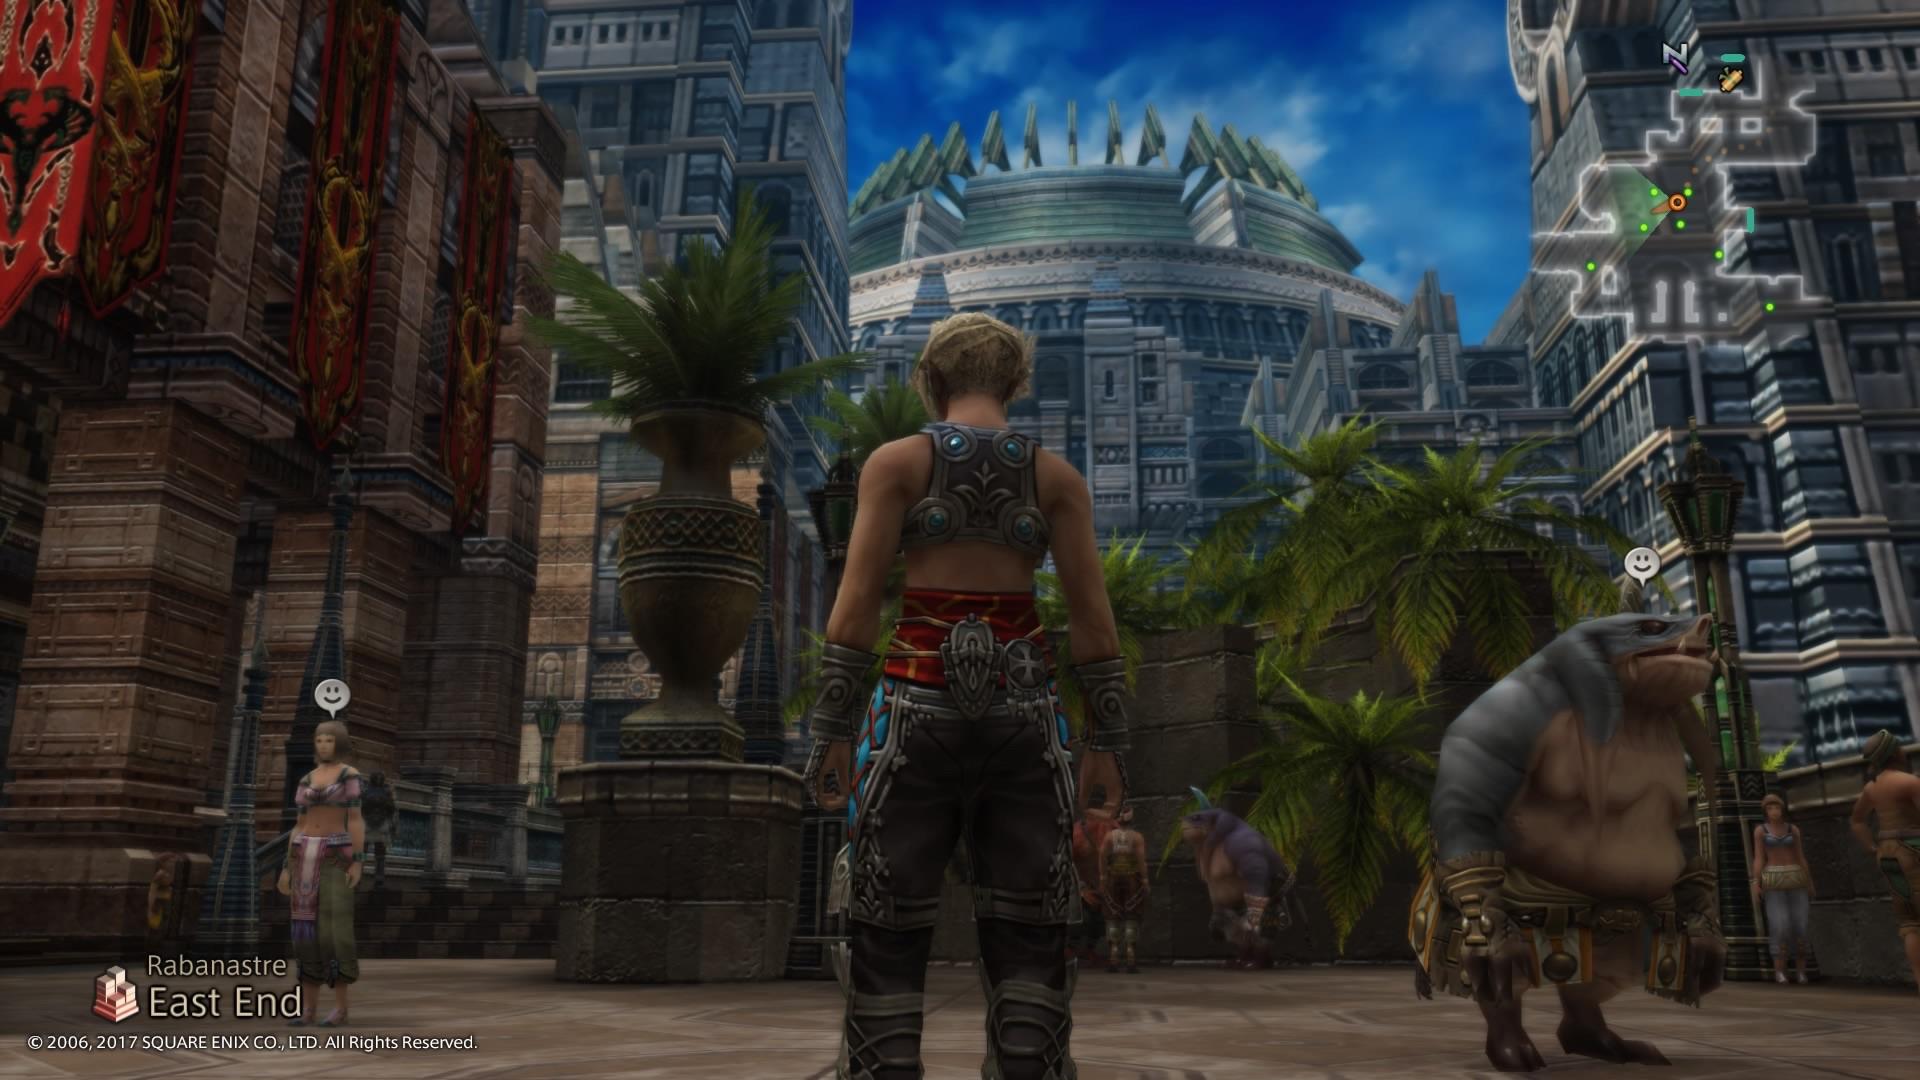 Final Fantasy Xii The Zodiac Age Review Duuro Magazine